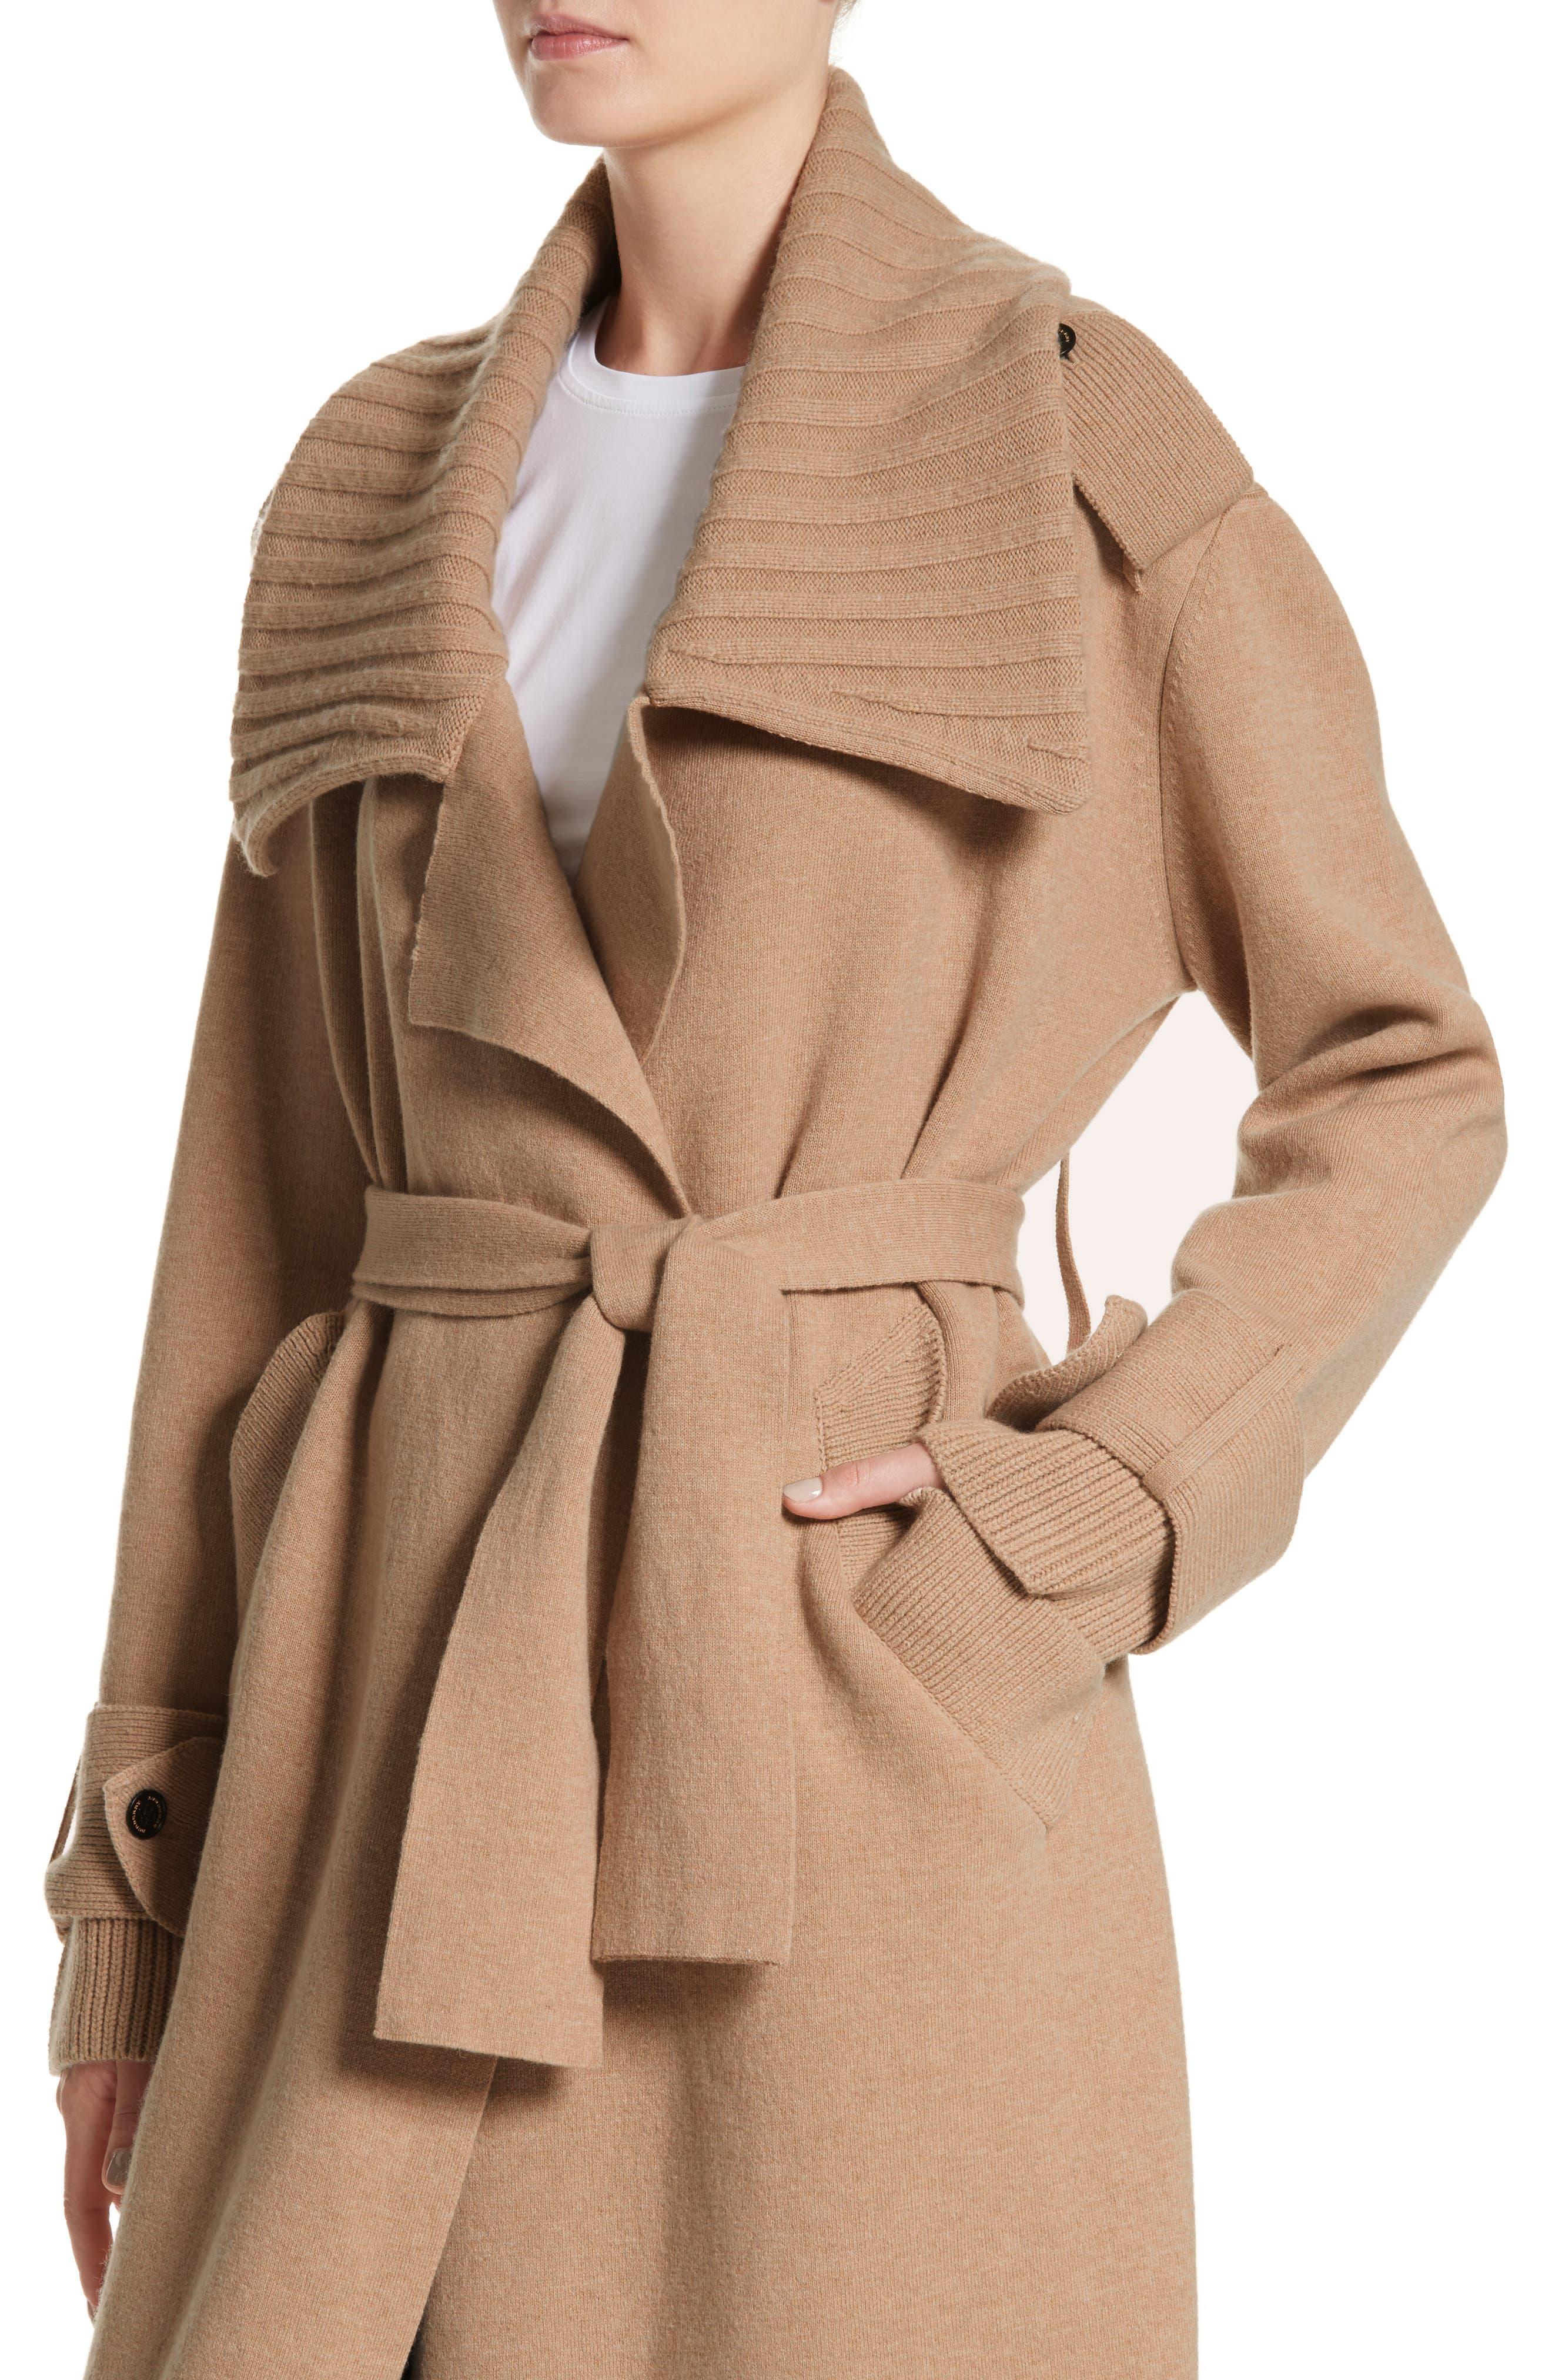 Piota Wool Blend Knit Trench Coat,                             Alternate thumbnail 4, color,                             Camel